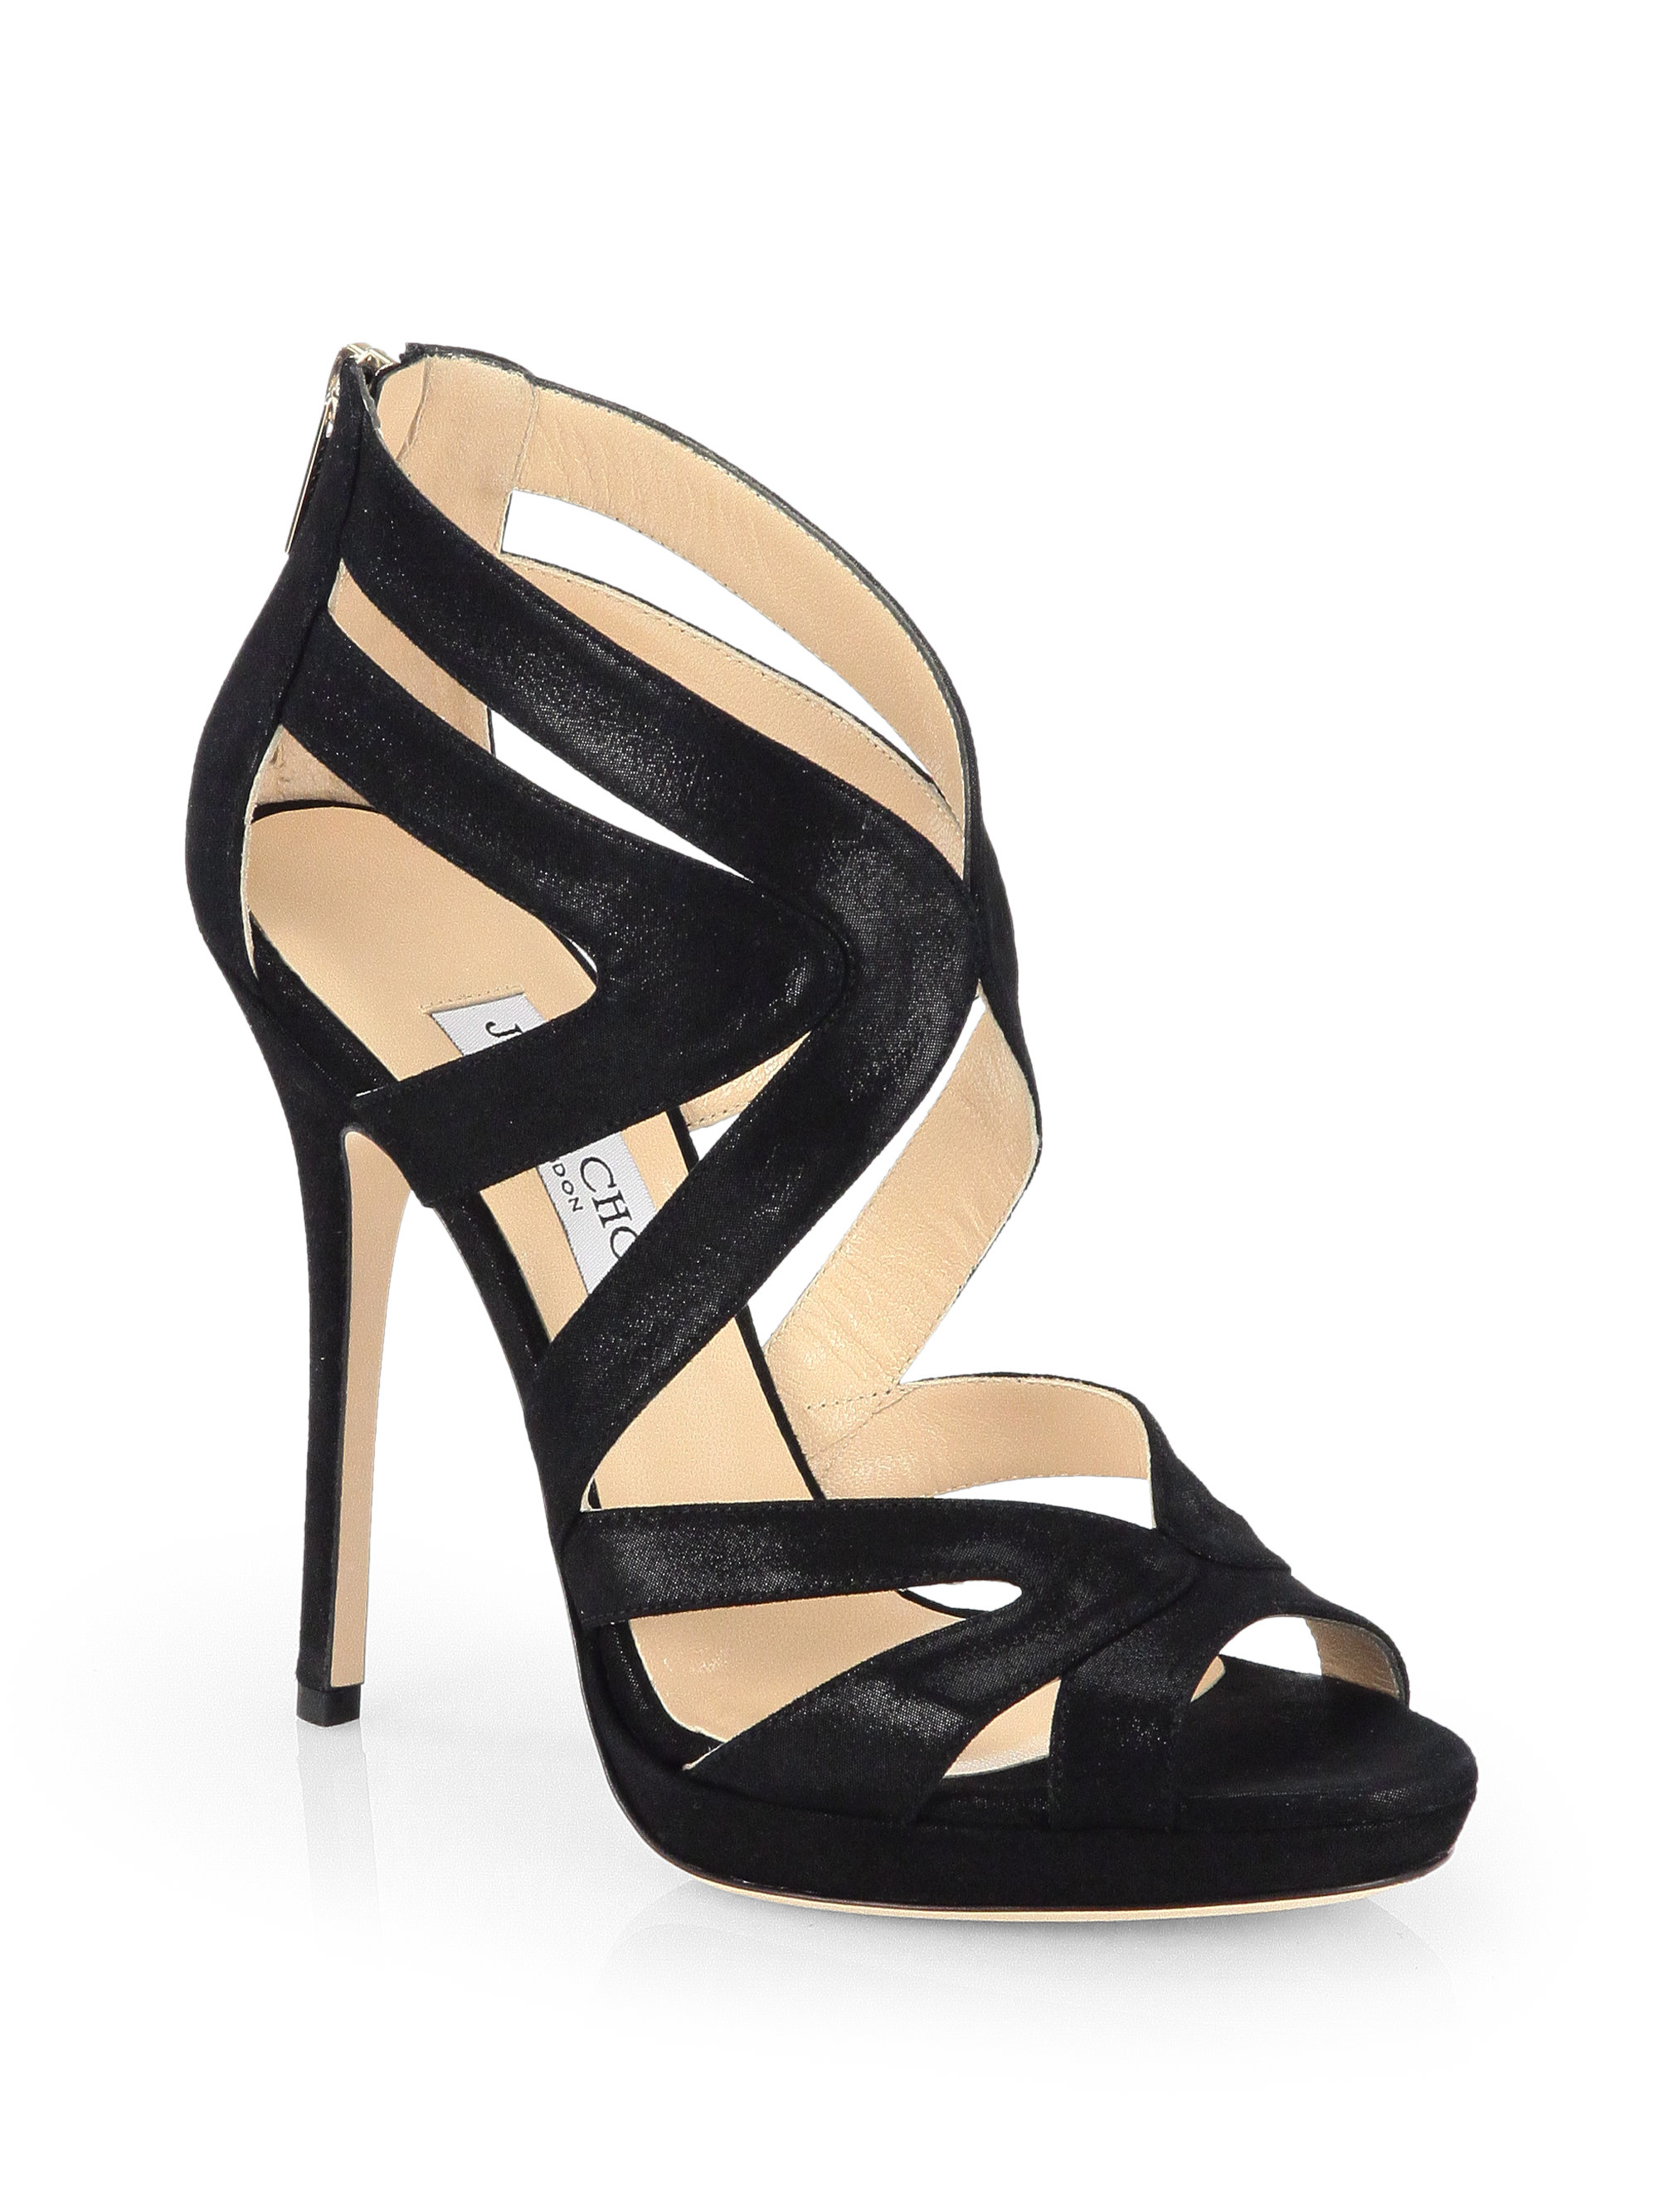 Jimmy Choo Collar Metallic Suede Platform Sandals In Black Lyst